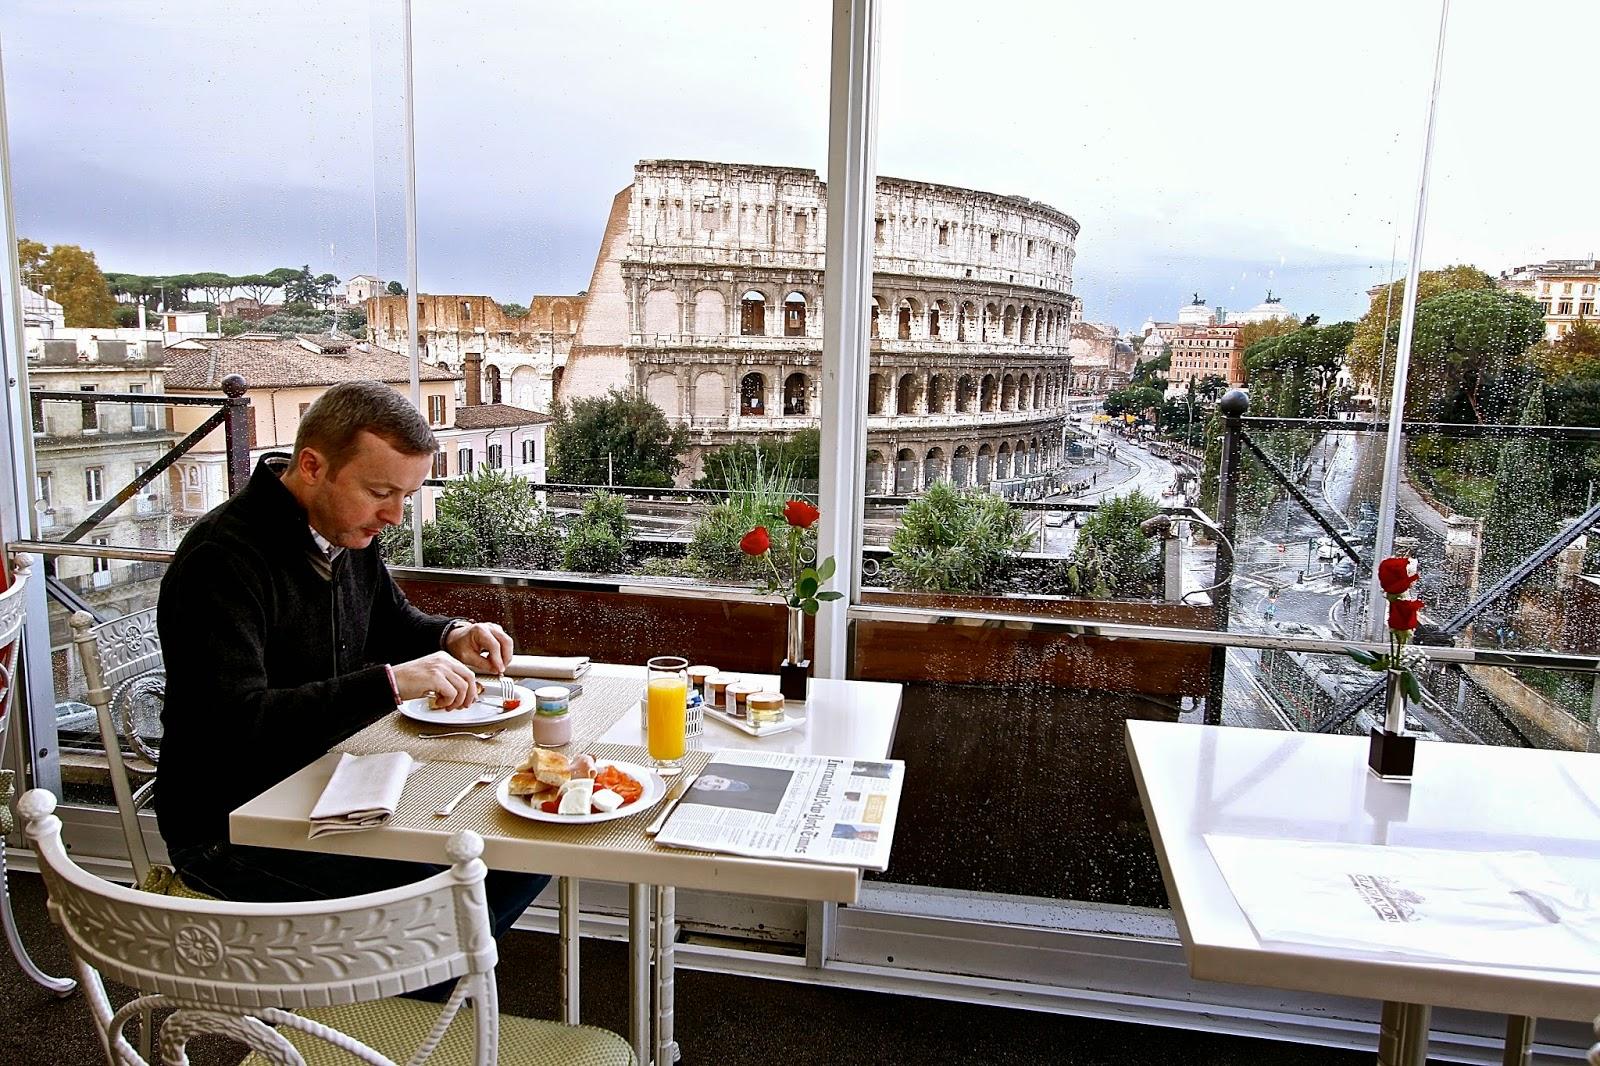 Baglioni Hotel Restaurant